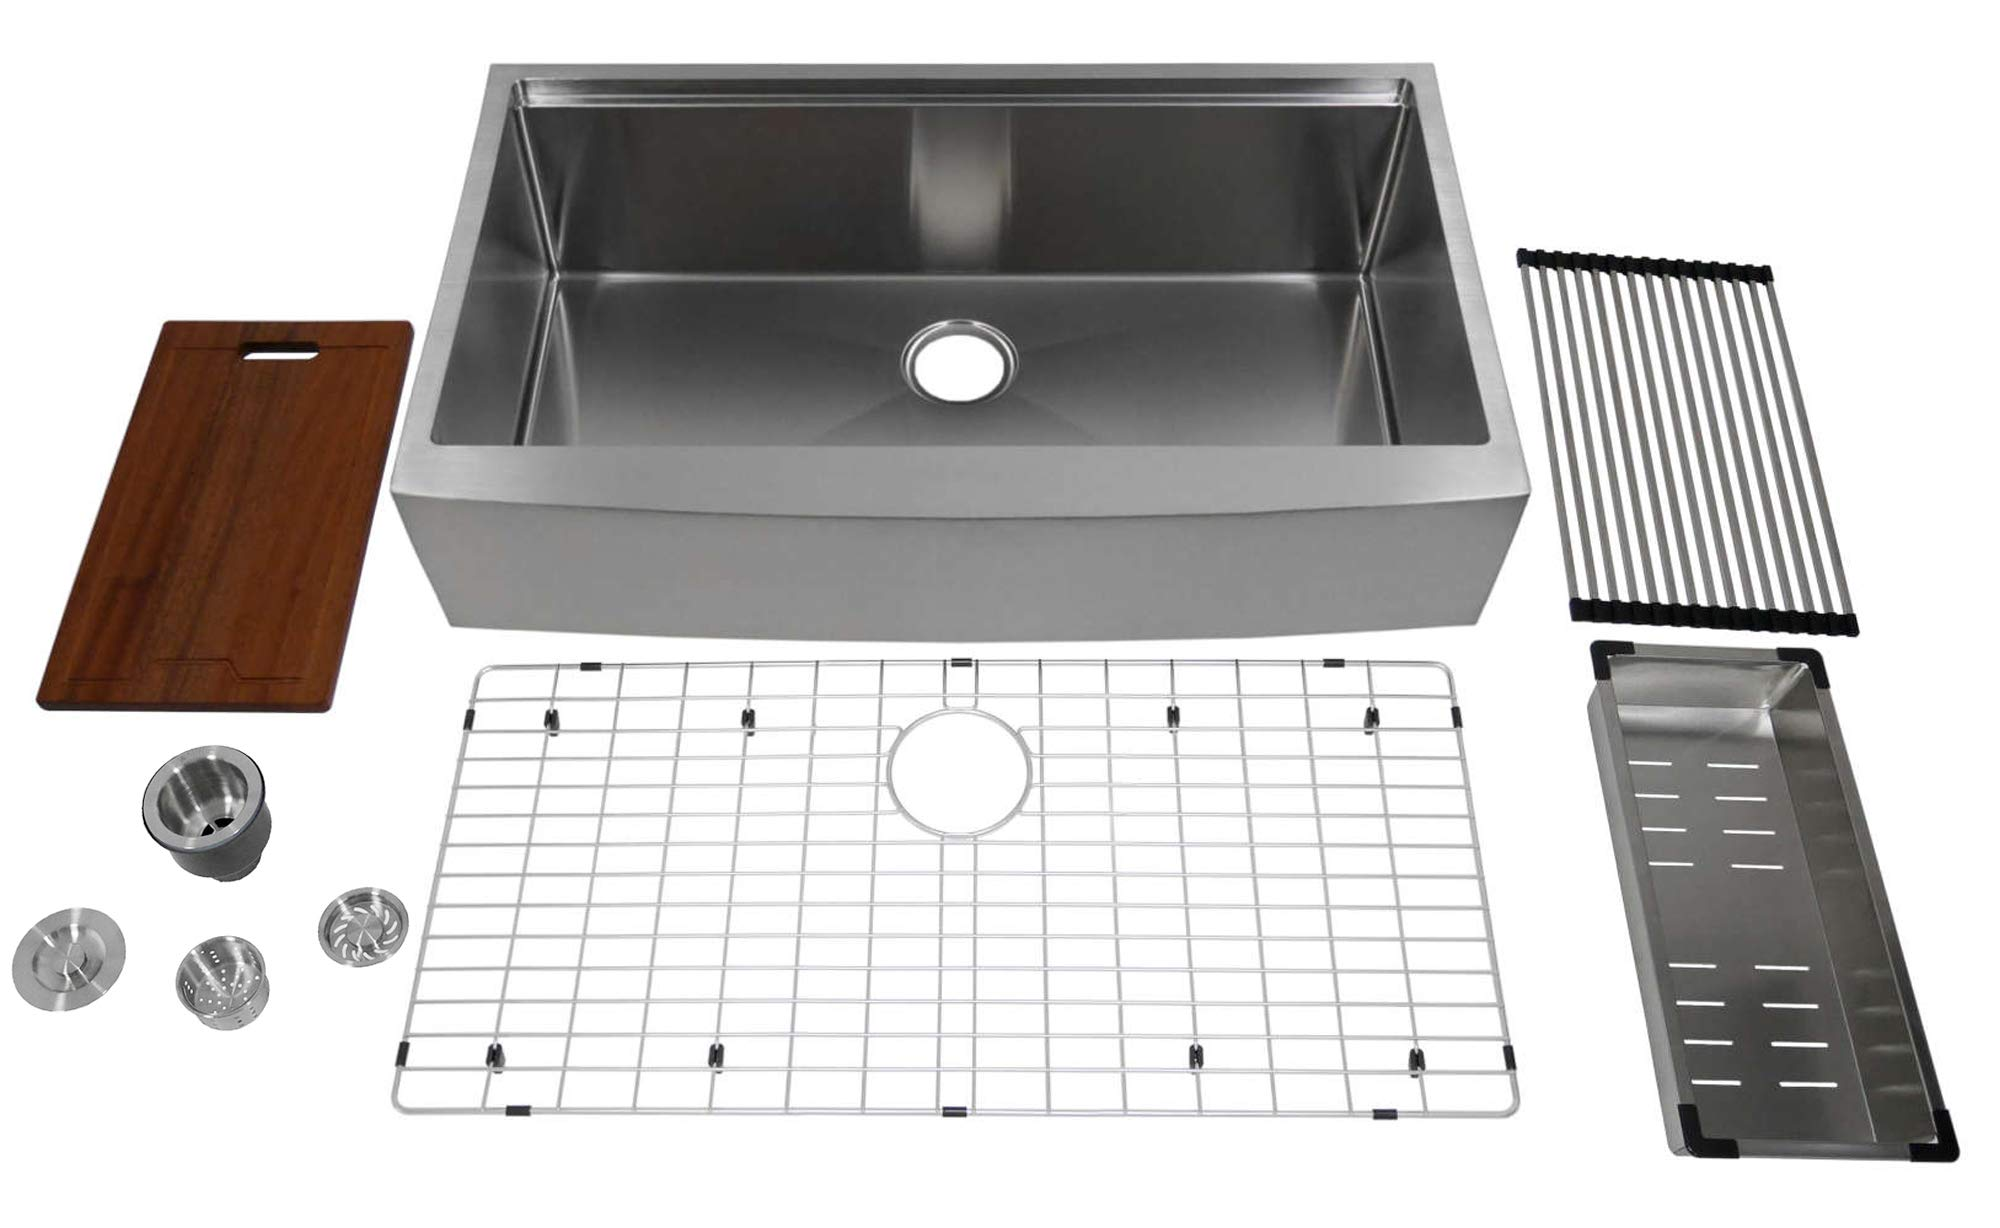 Auric 36 Retro Fit Curved Apron Front Workstation Farmhouse Kitchen Sink Stainless Steel Short Apron Single Bowl Scal 16 36 Retro Sgl Combo Amazon Com